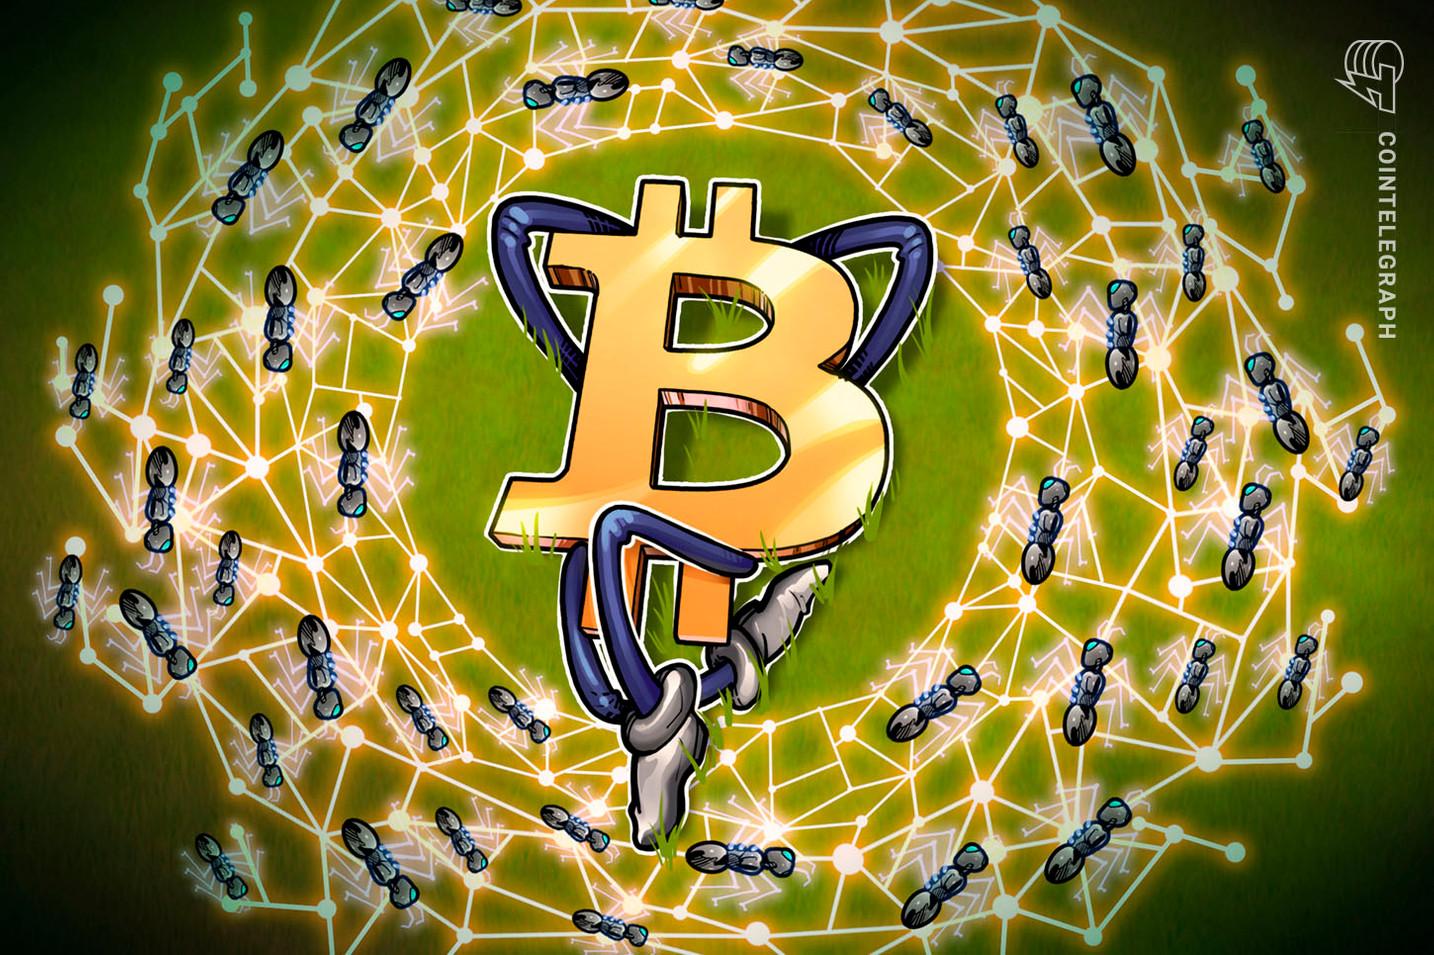 Contagem de nós da rede Bitcoin estabelece novos recordes